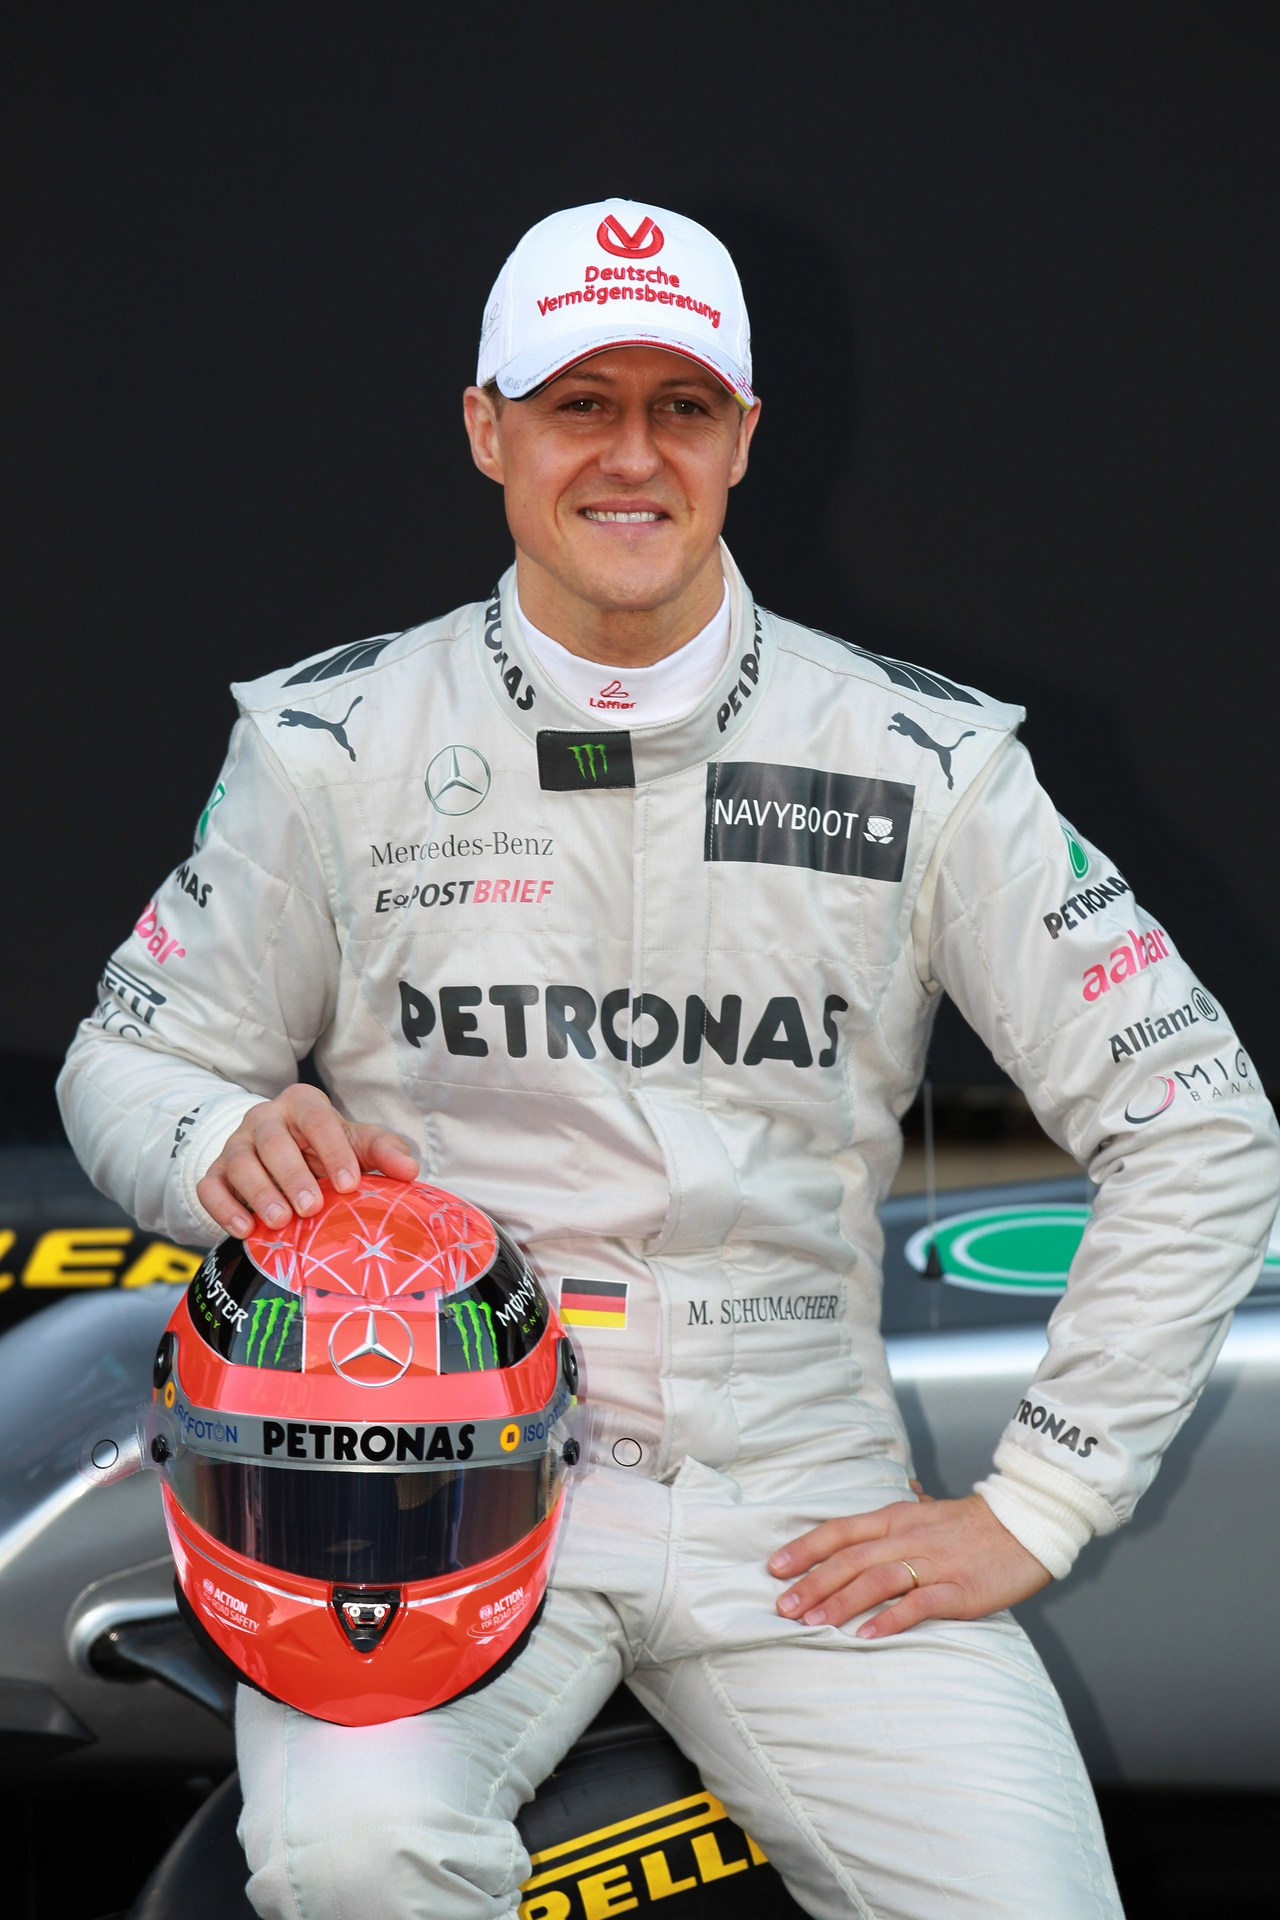 21.02.2012 Barcelona, Spain, Michael Schumacher (GER), Mercedes GP - Mercedes F1 W03 Launch